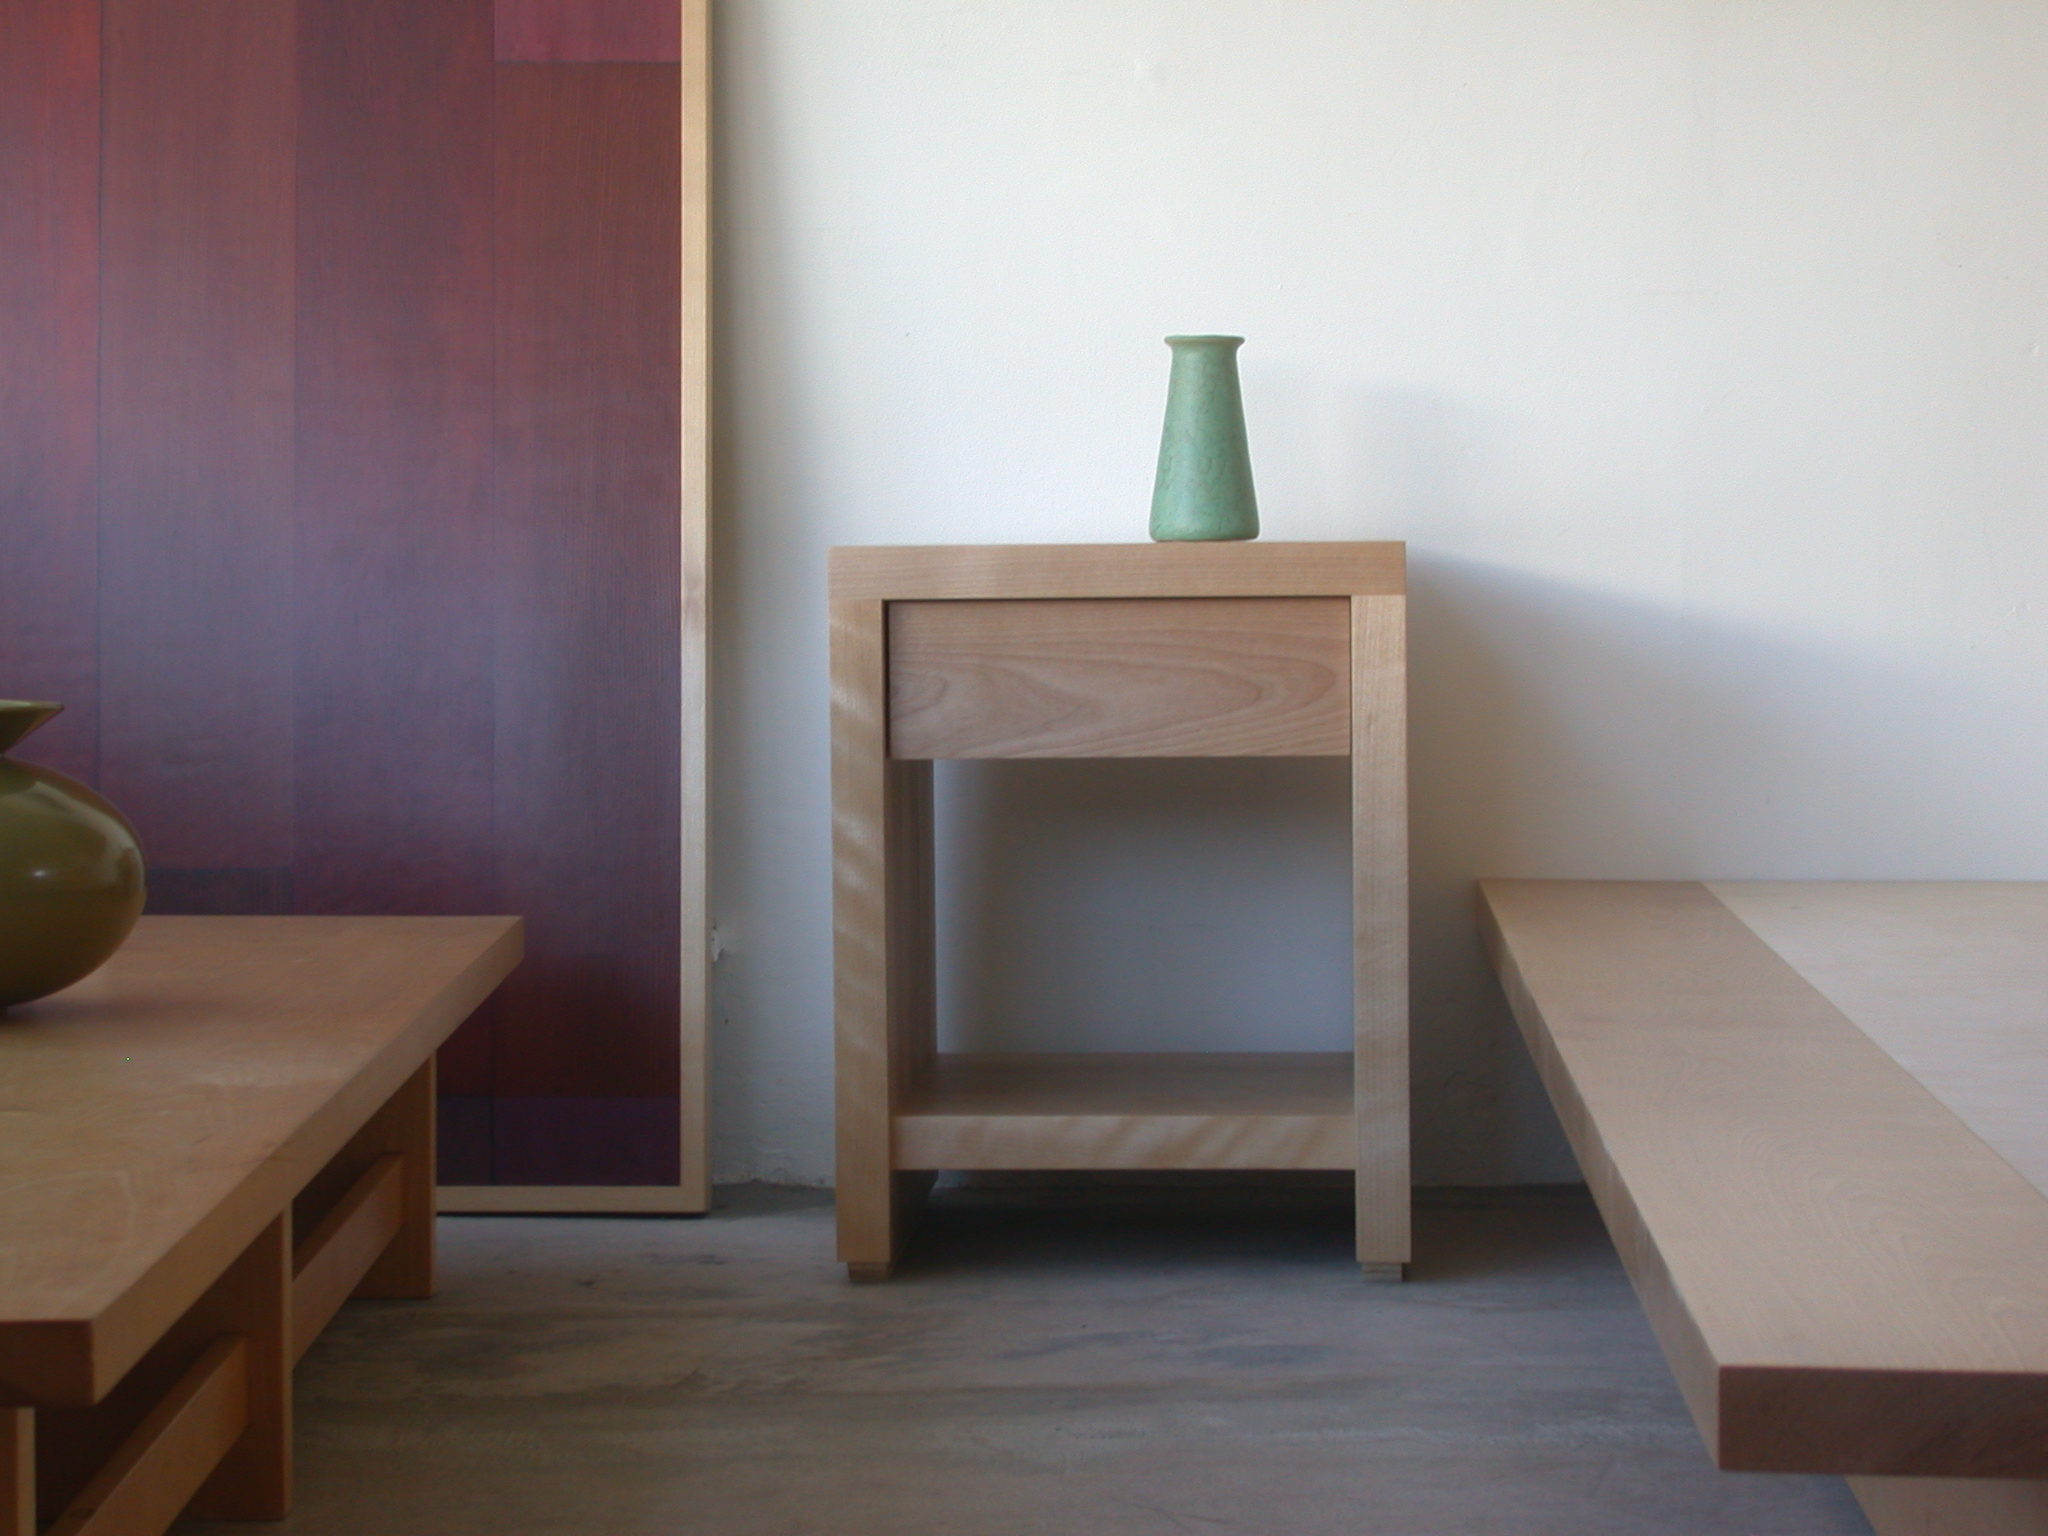 october side table front shot.JPG.jpg